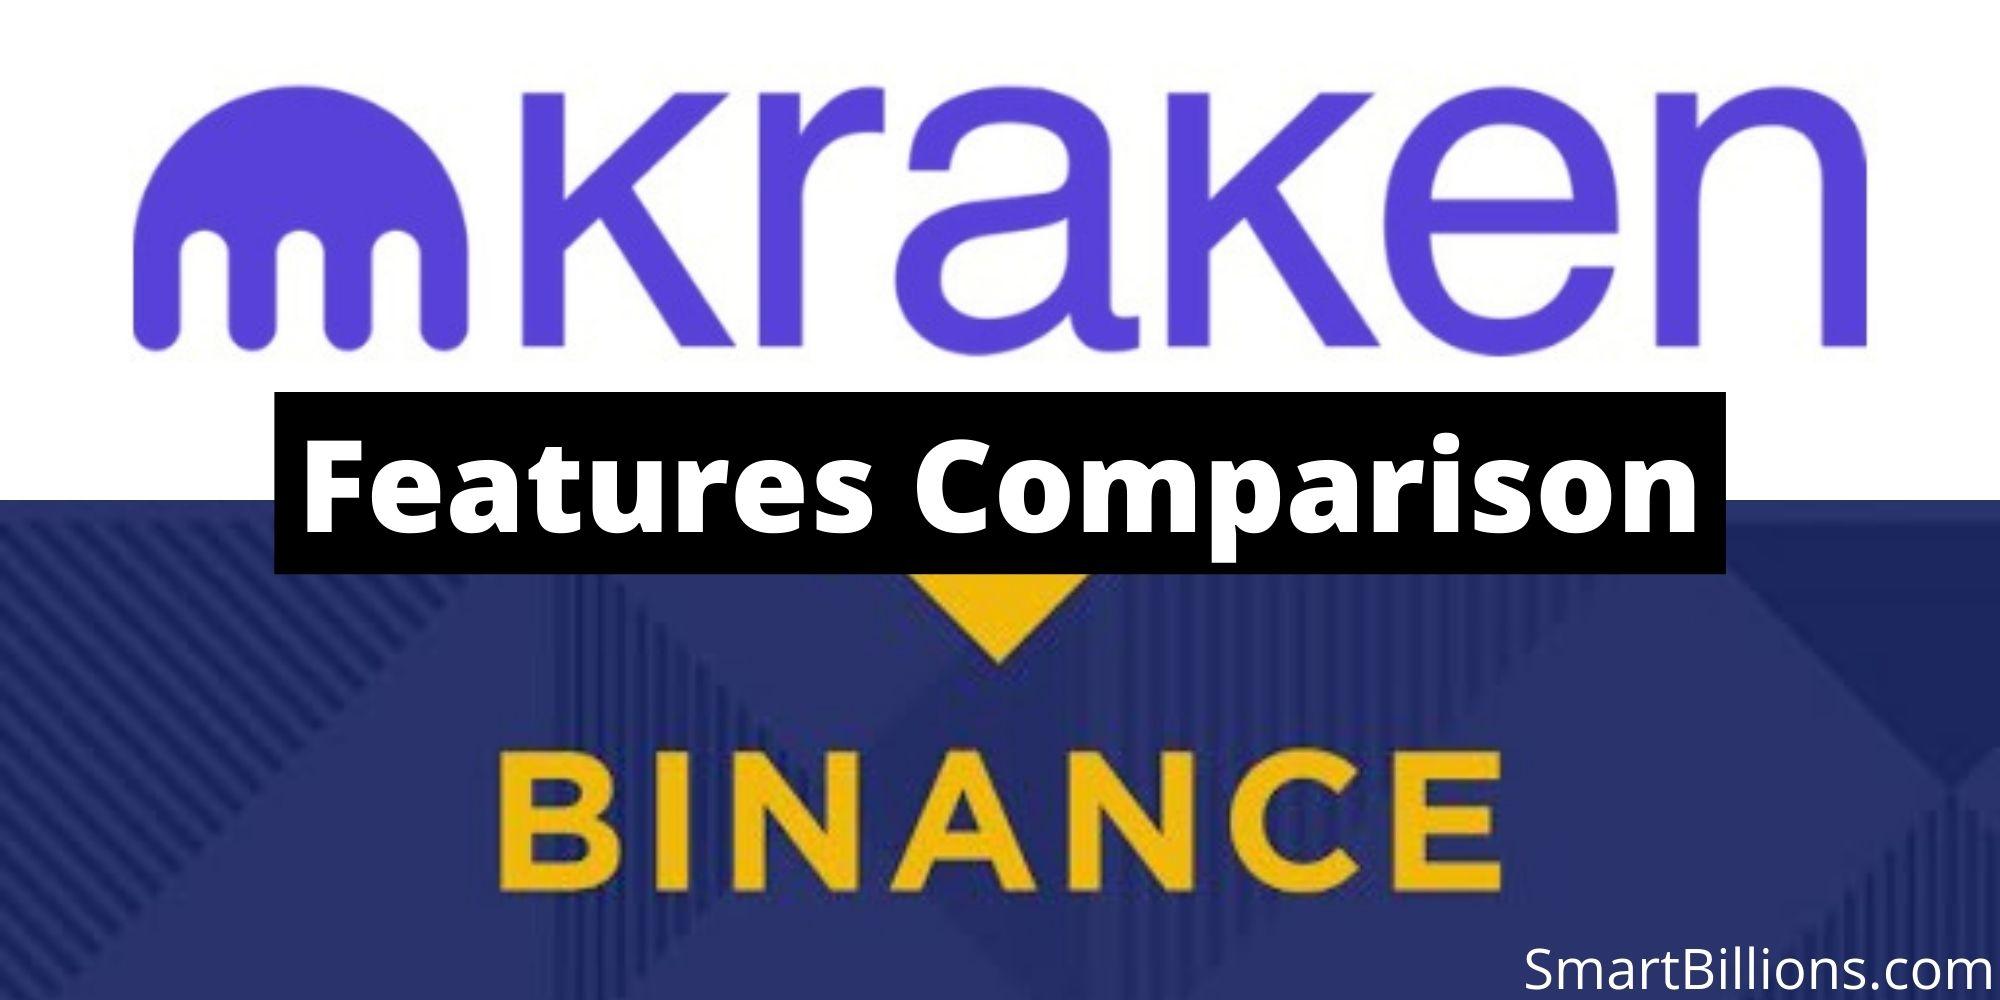 kraken vs binance features comparison